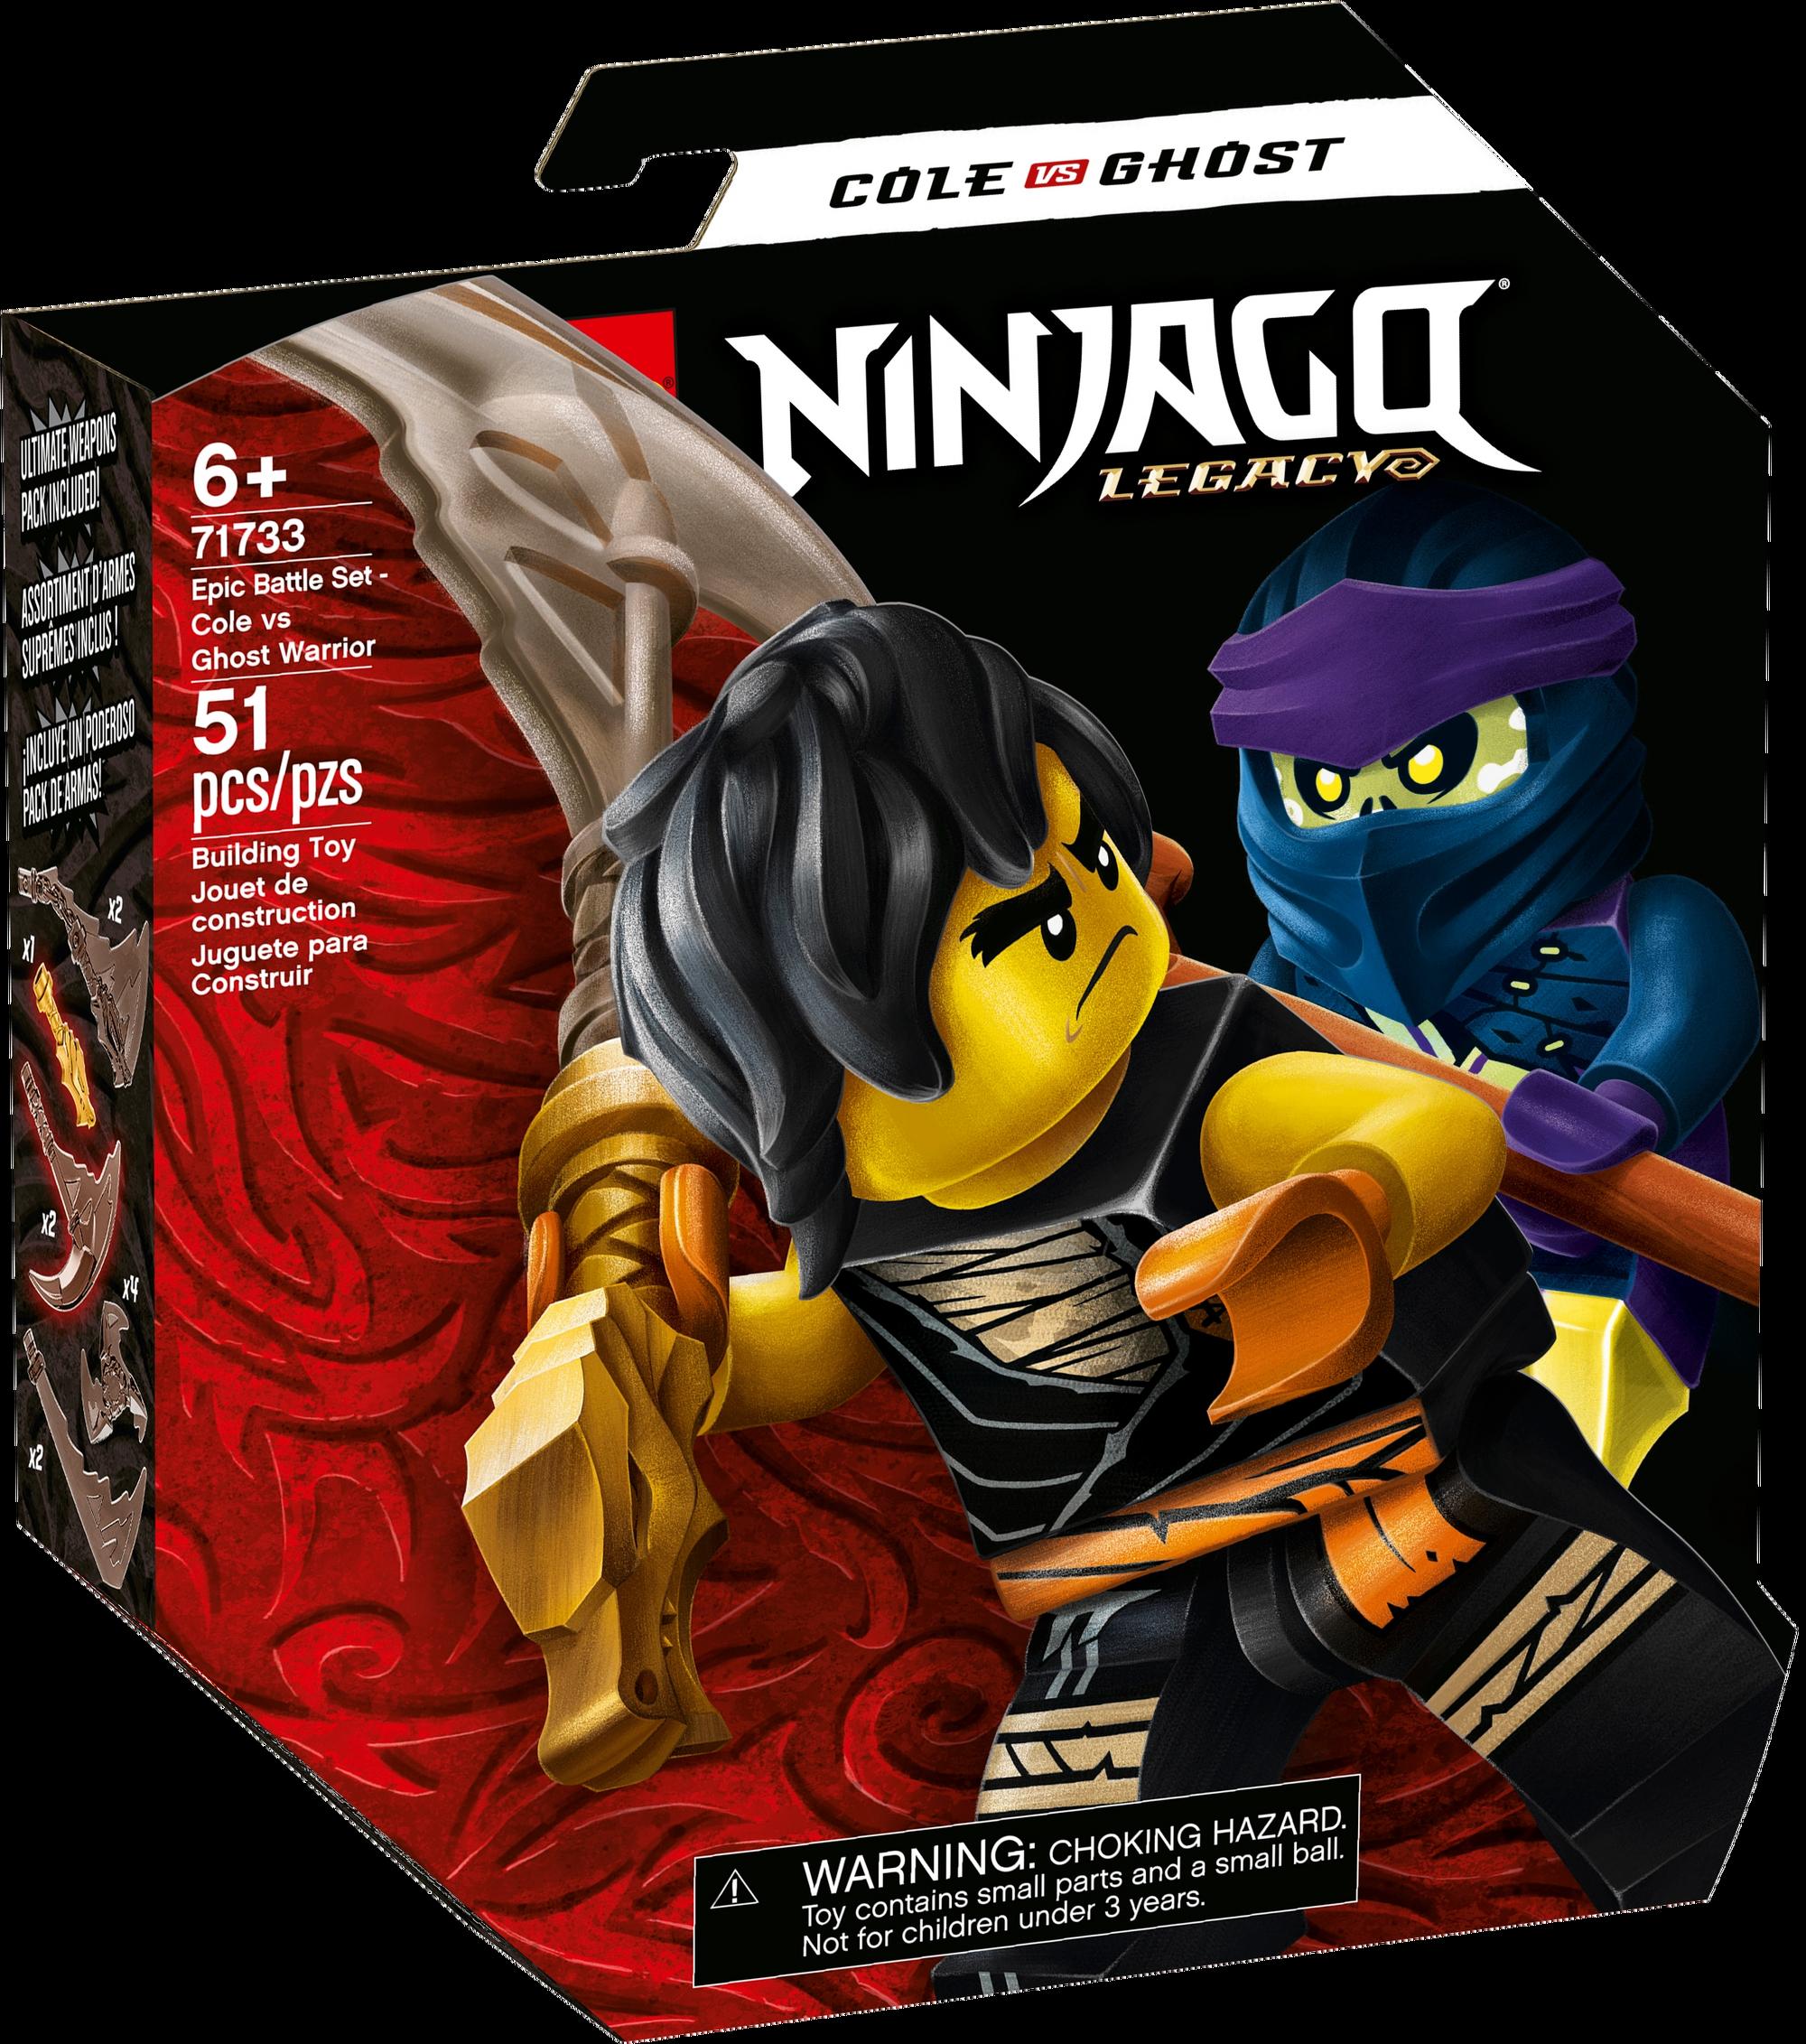 71733 Epic Battle Set - Cole vs. Ghost Warrior | Ninjago Wiki